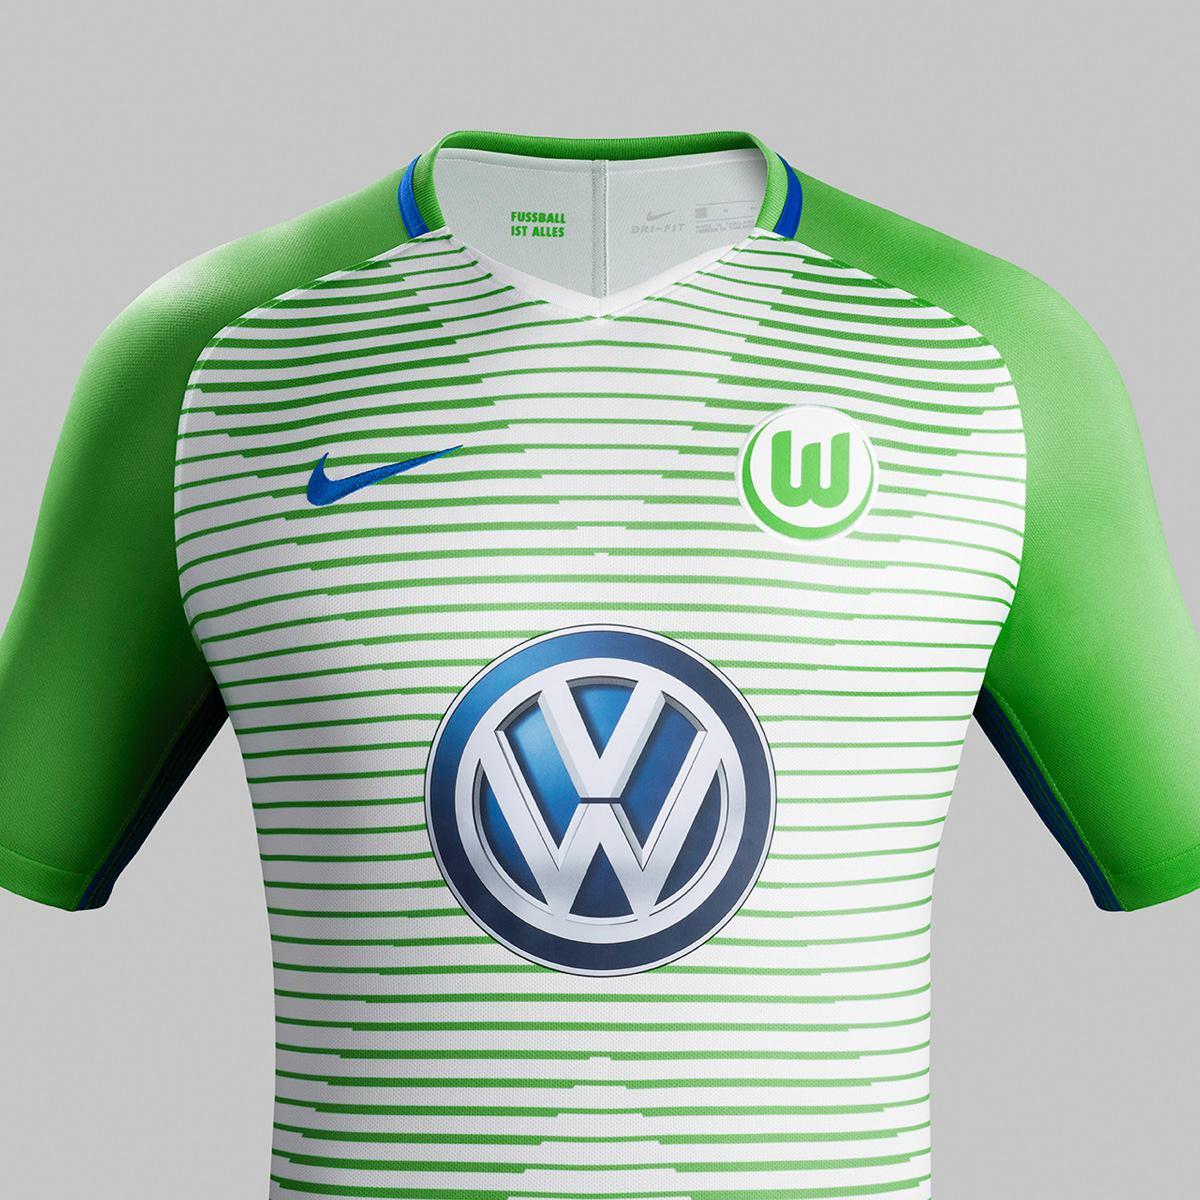 wholesale dealer af401 9fff3 VfL Wolfsburg US on Twitter: